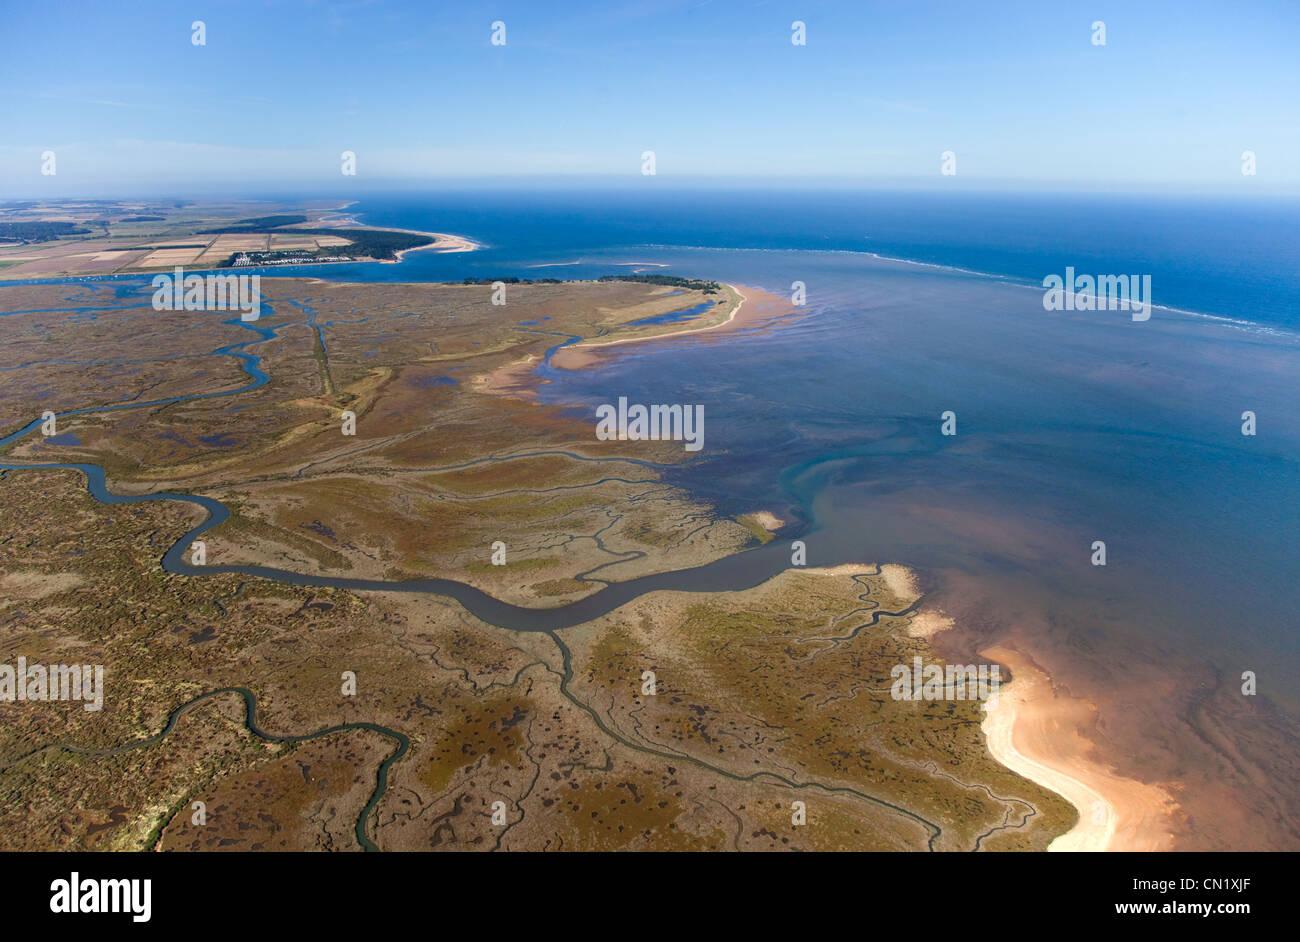 Stiffkey Salt Marshes & Holkham Bay Norfolk from the air Stock Photo